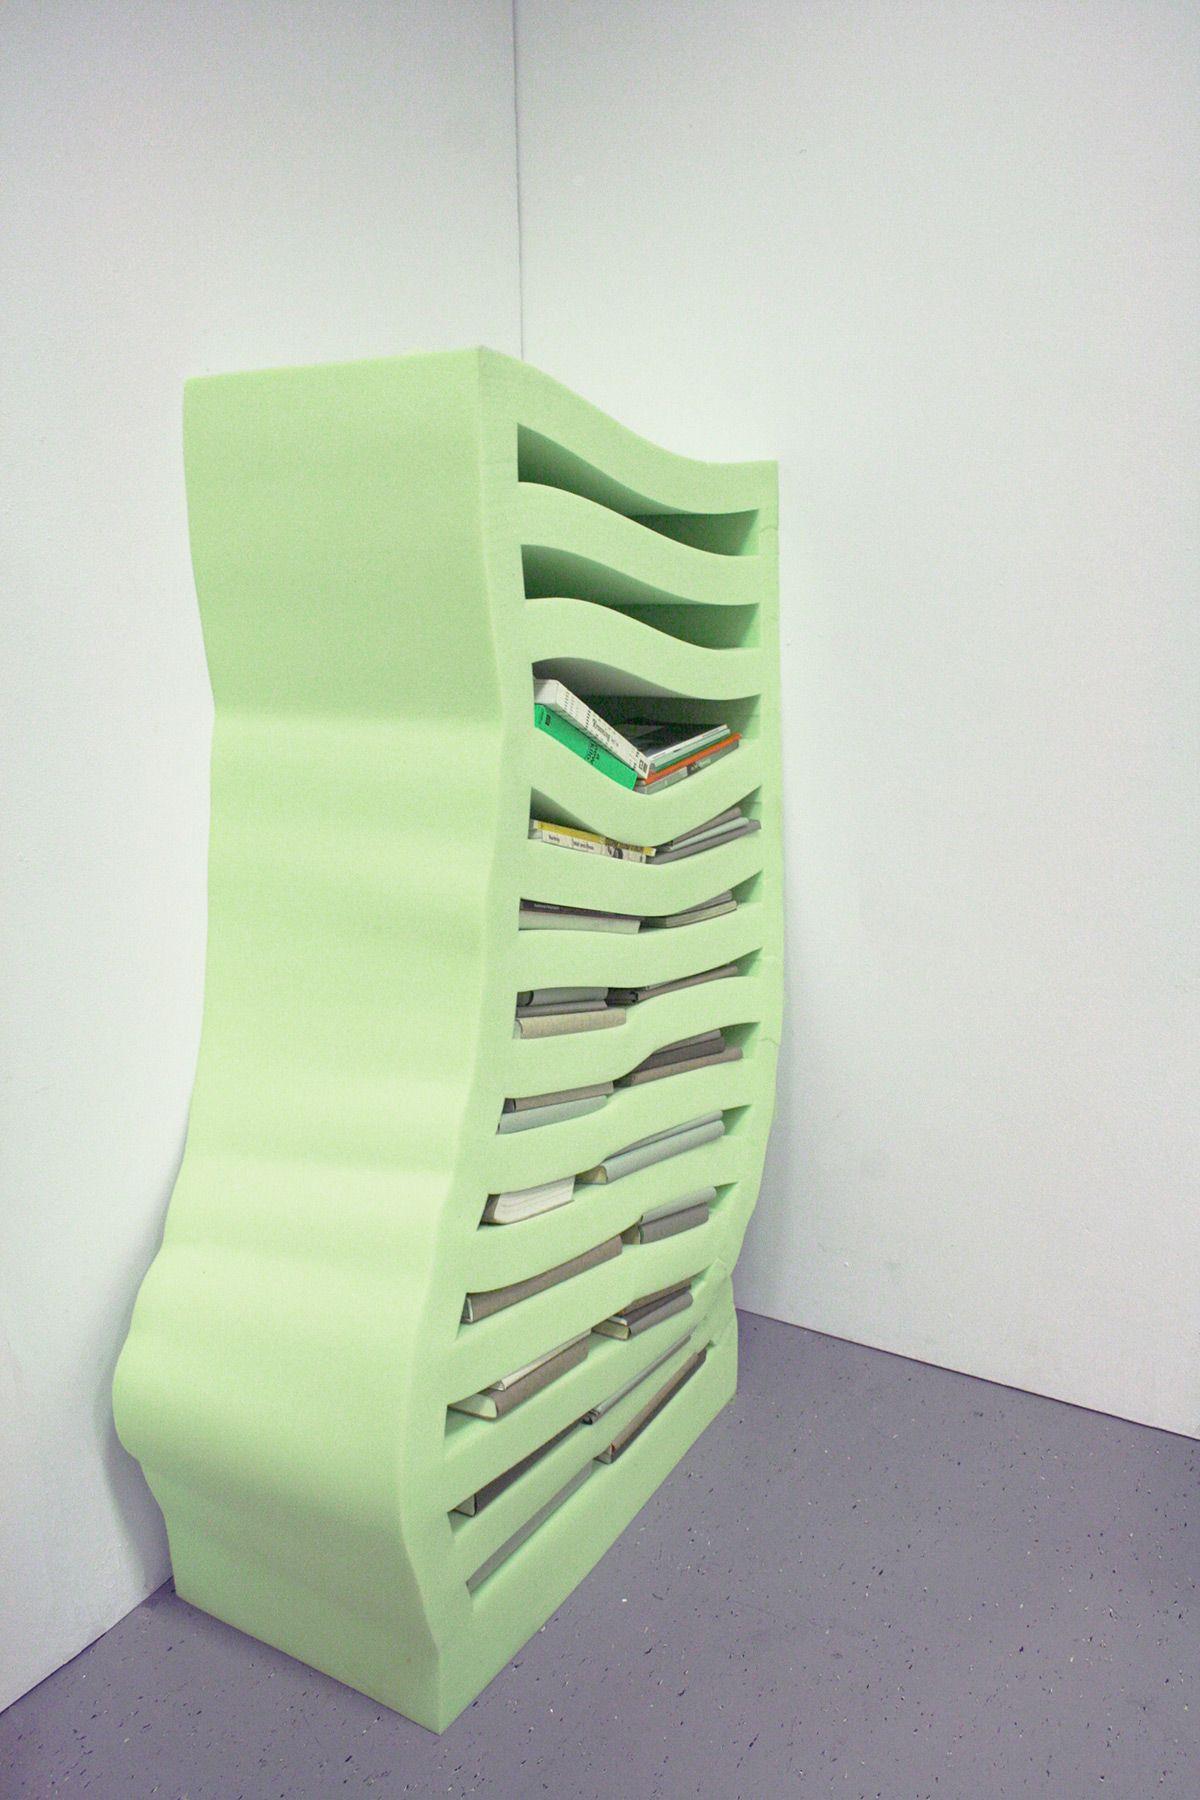 Soft Cabinet Collection By Devi Van De Klomp Studio Digsdigs Soft Furniture Design Milk Interior Furniture